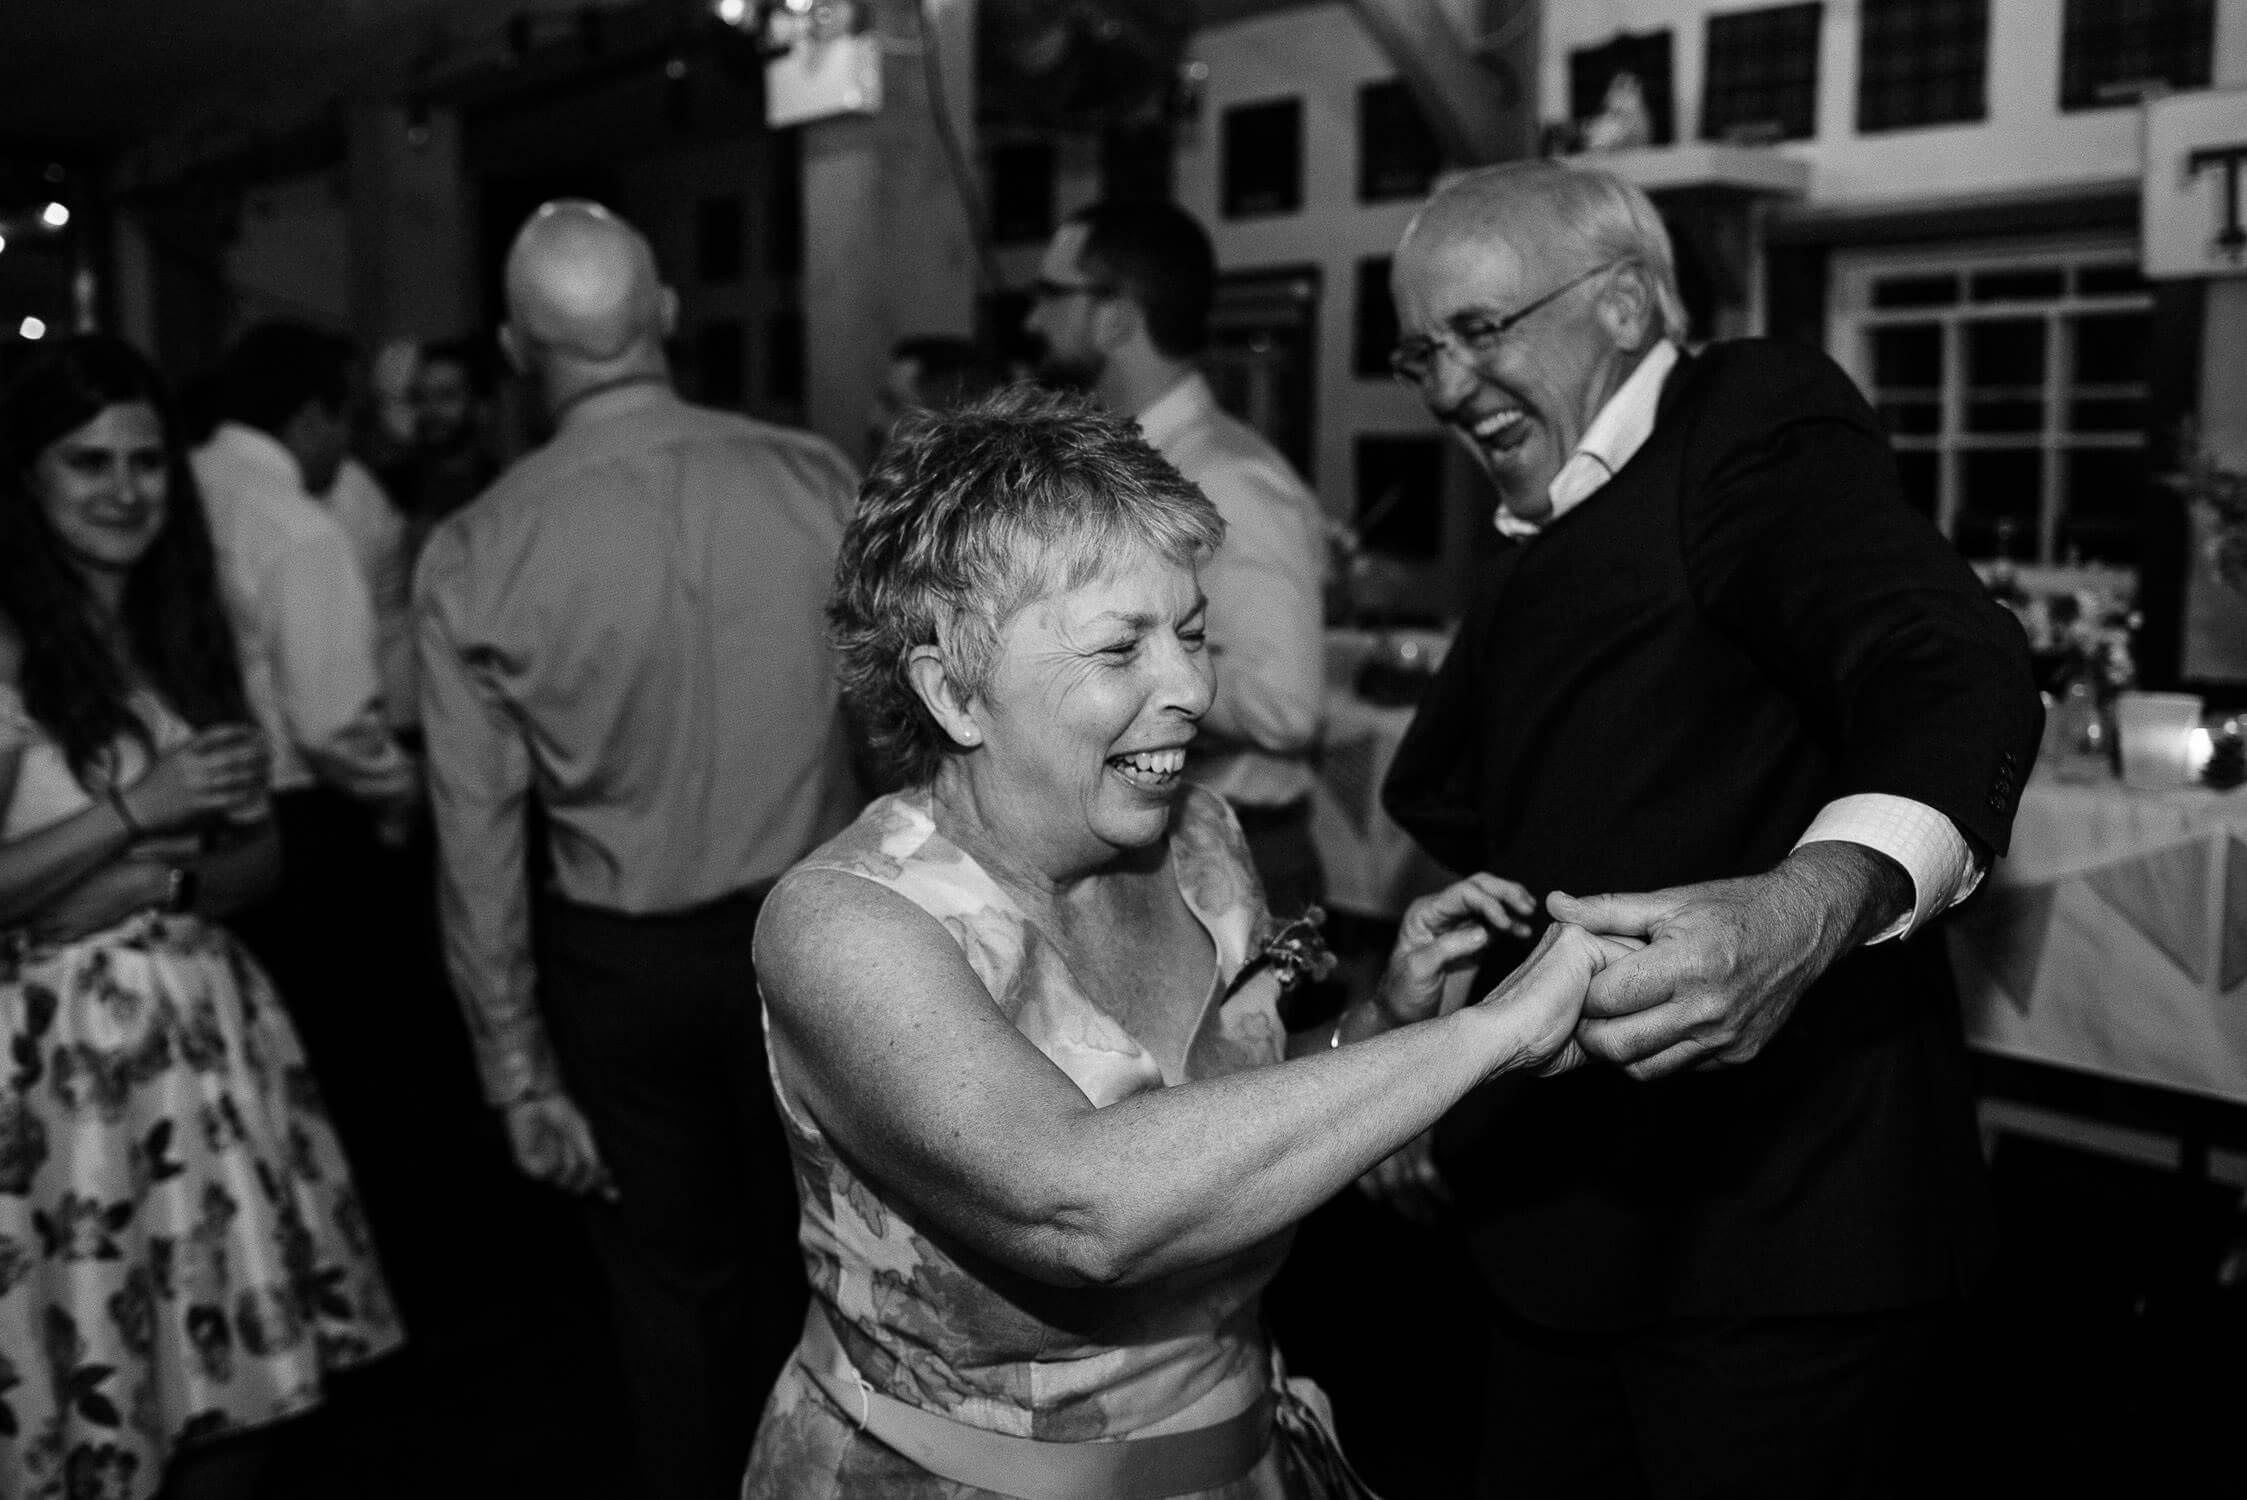 wedding guests having fun dancing at a reception